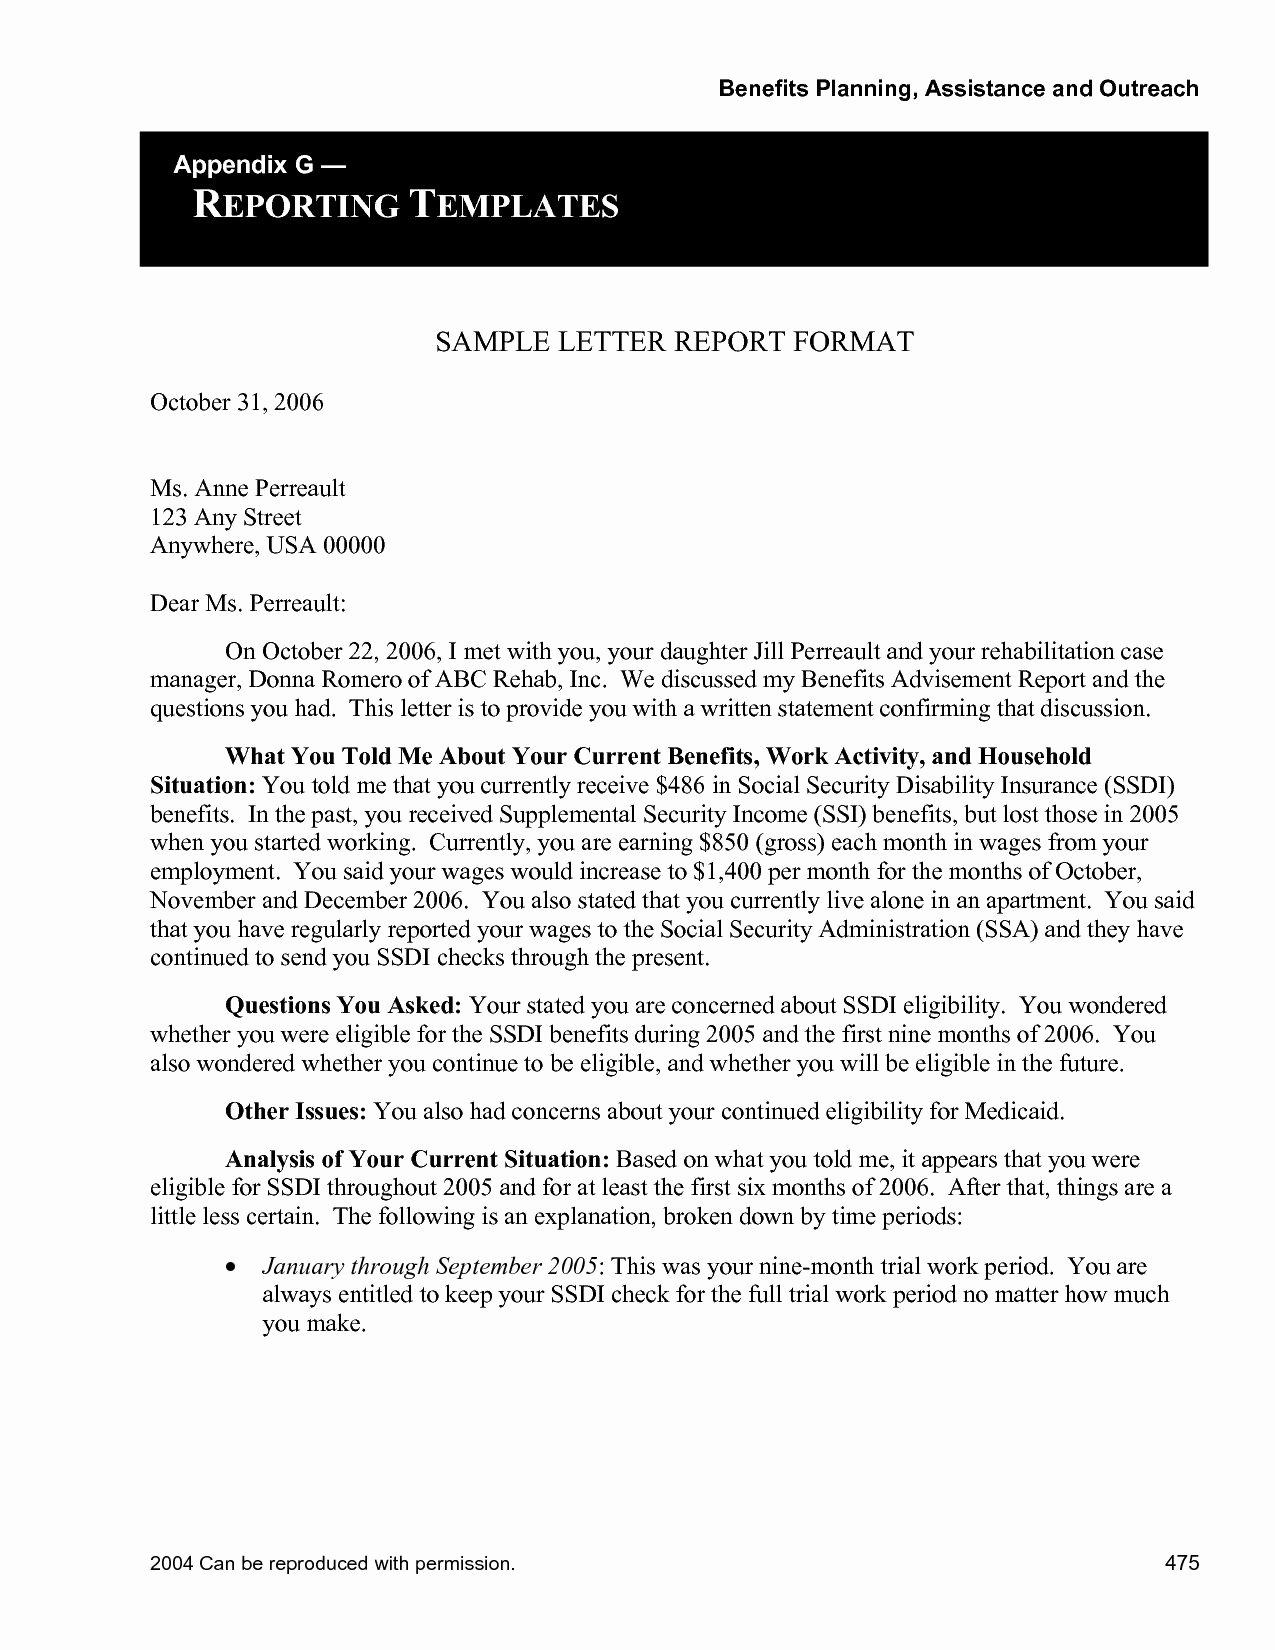 Incident Statement Letter Sample Best Of Incident Report Letter Sample In Workplace Glendale